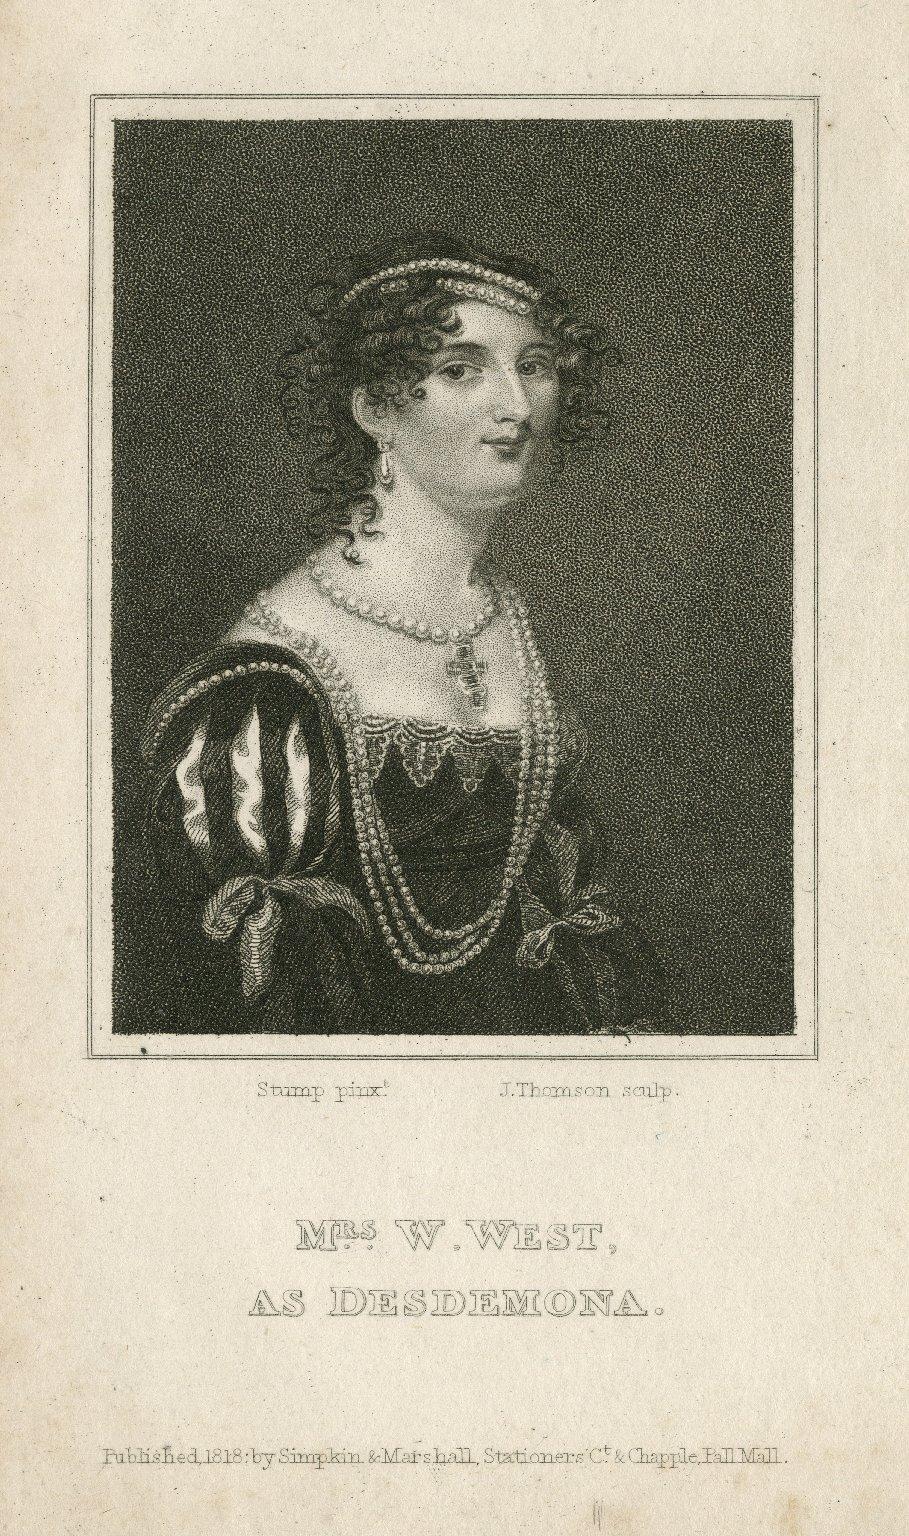 Mrs. W. West as Desdemona [in Shakespeare's Othello] [graphic] / [Samuel John] Stump, pinxt. ; J. Thomson, sculp.